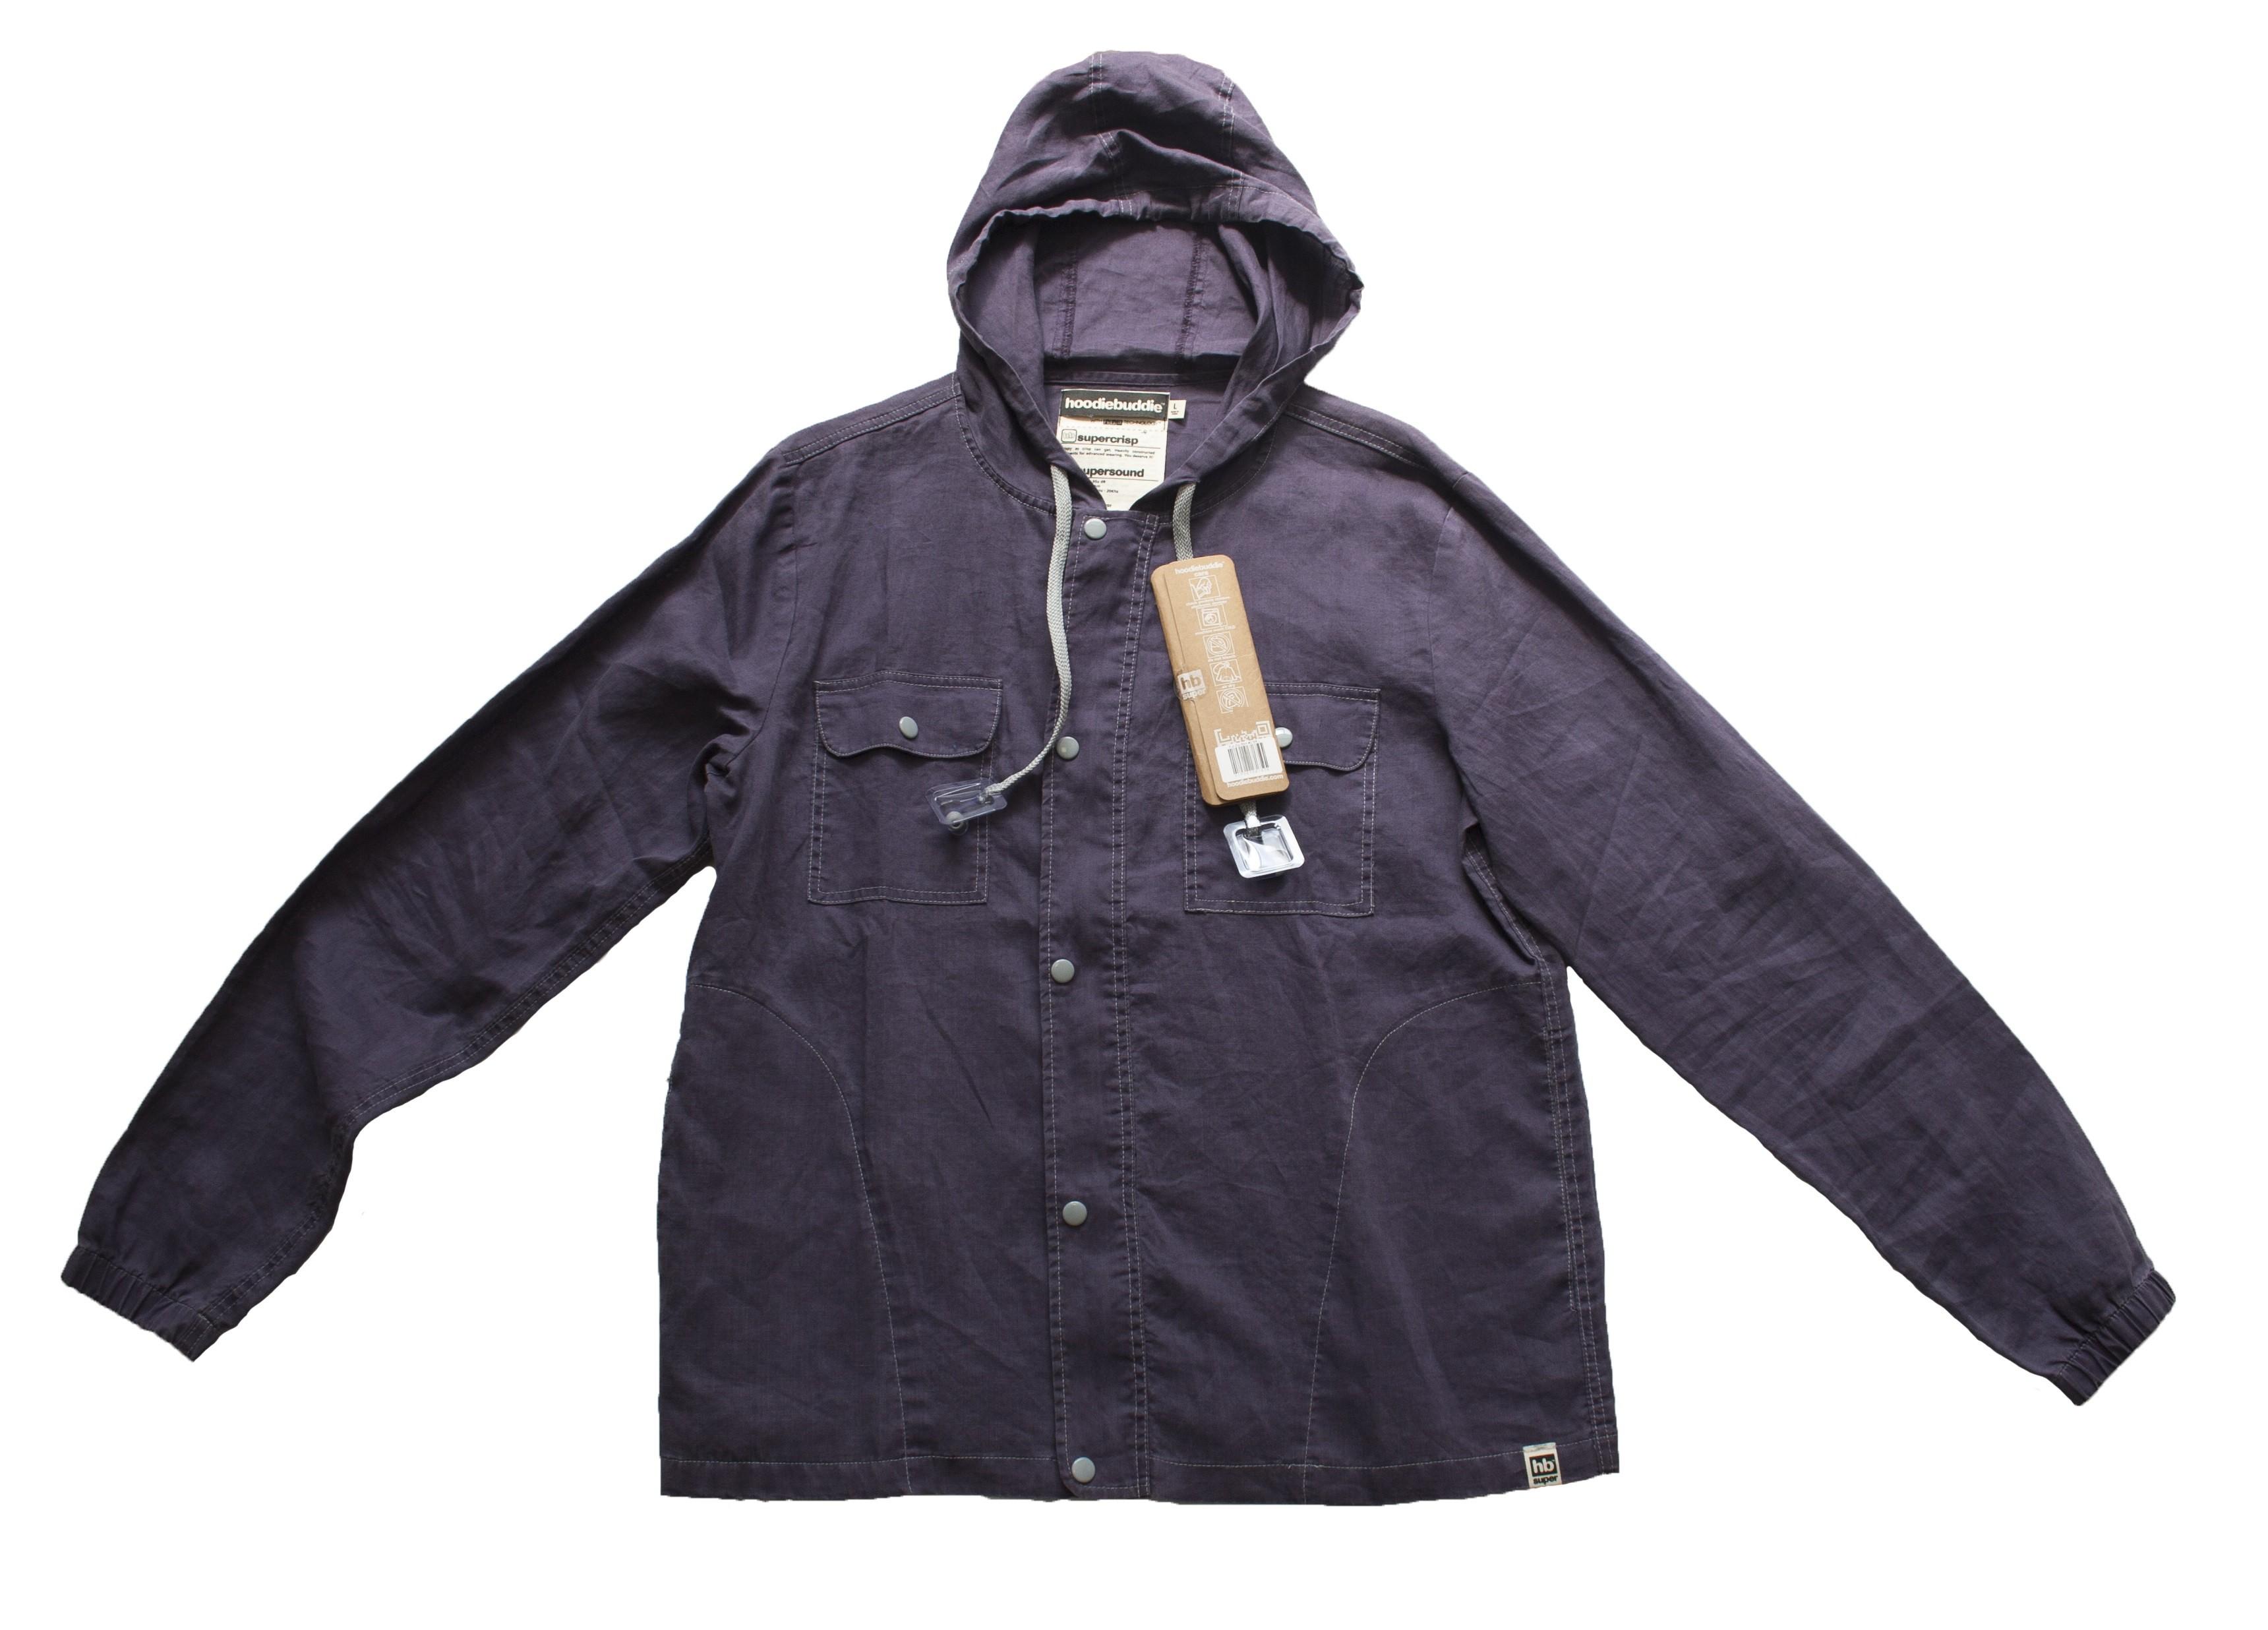 HOODIE BUDDIE Senior Full Zip Shirt Variation #2